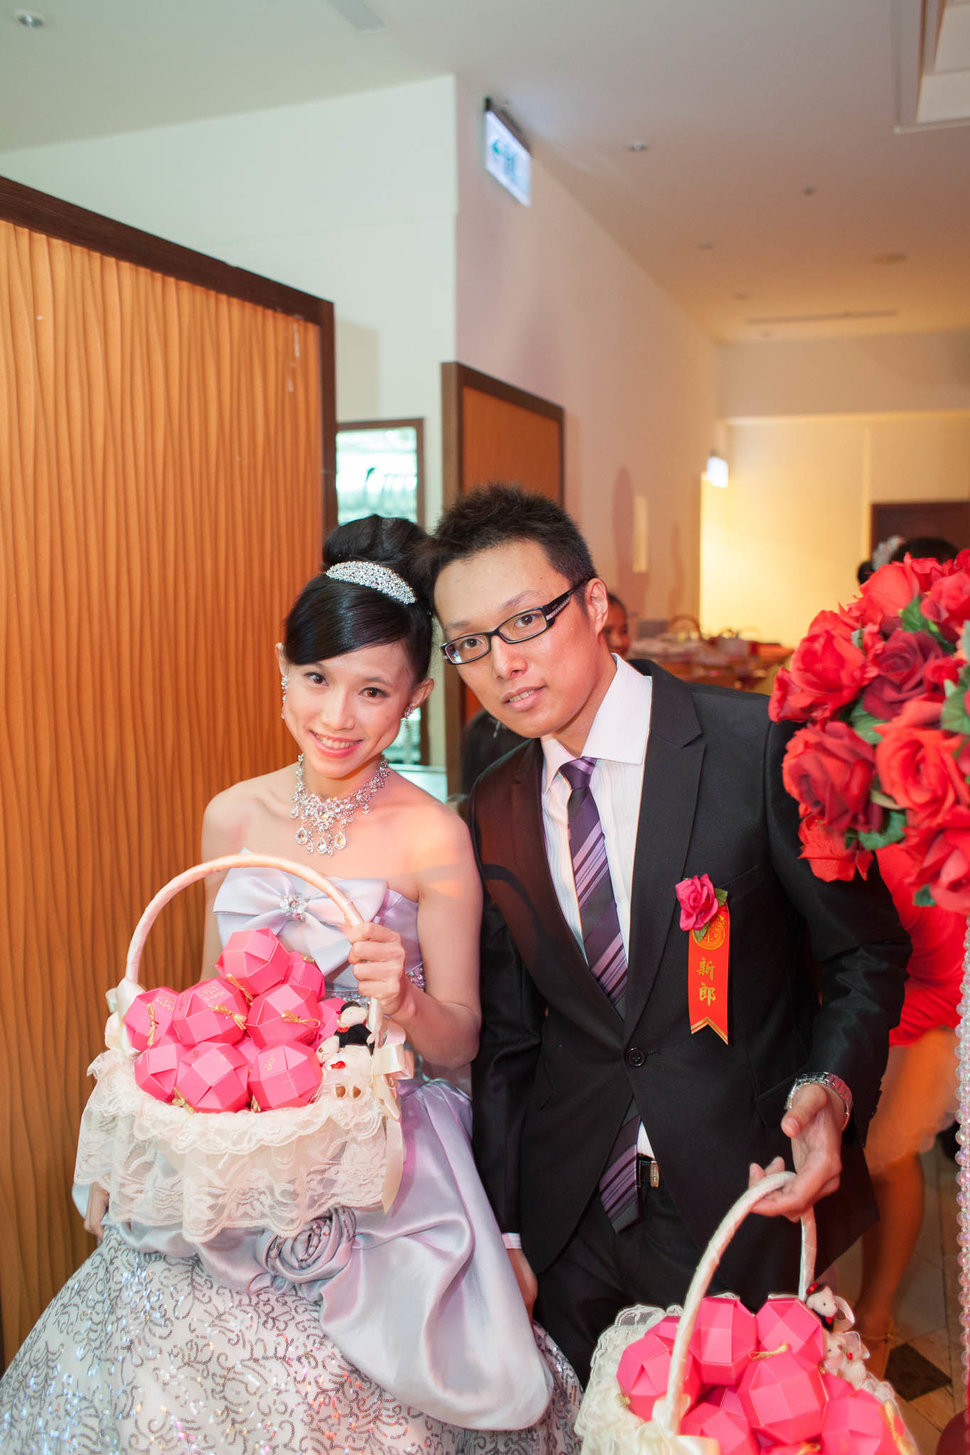 18PHOTO-青蛙王子娶新娘❤️(編號:218648) - 18PHOTO 婚紗影像攝影工作室 - 結婚吧